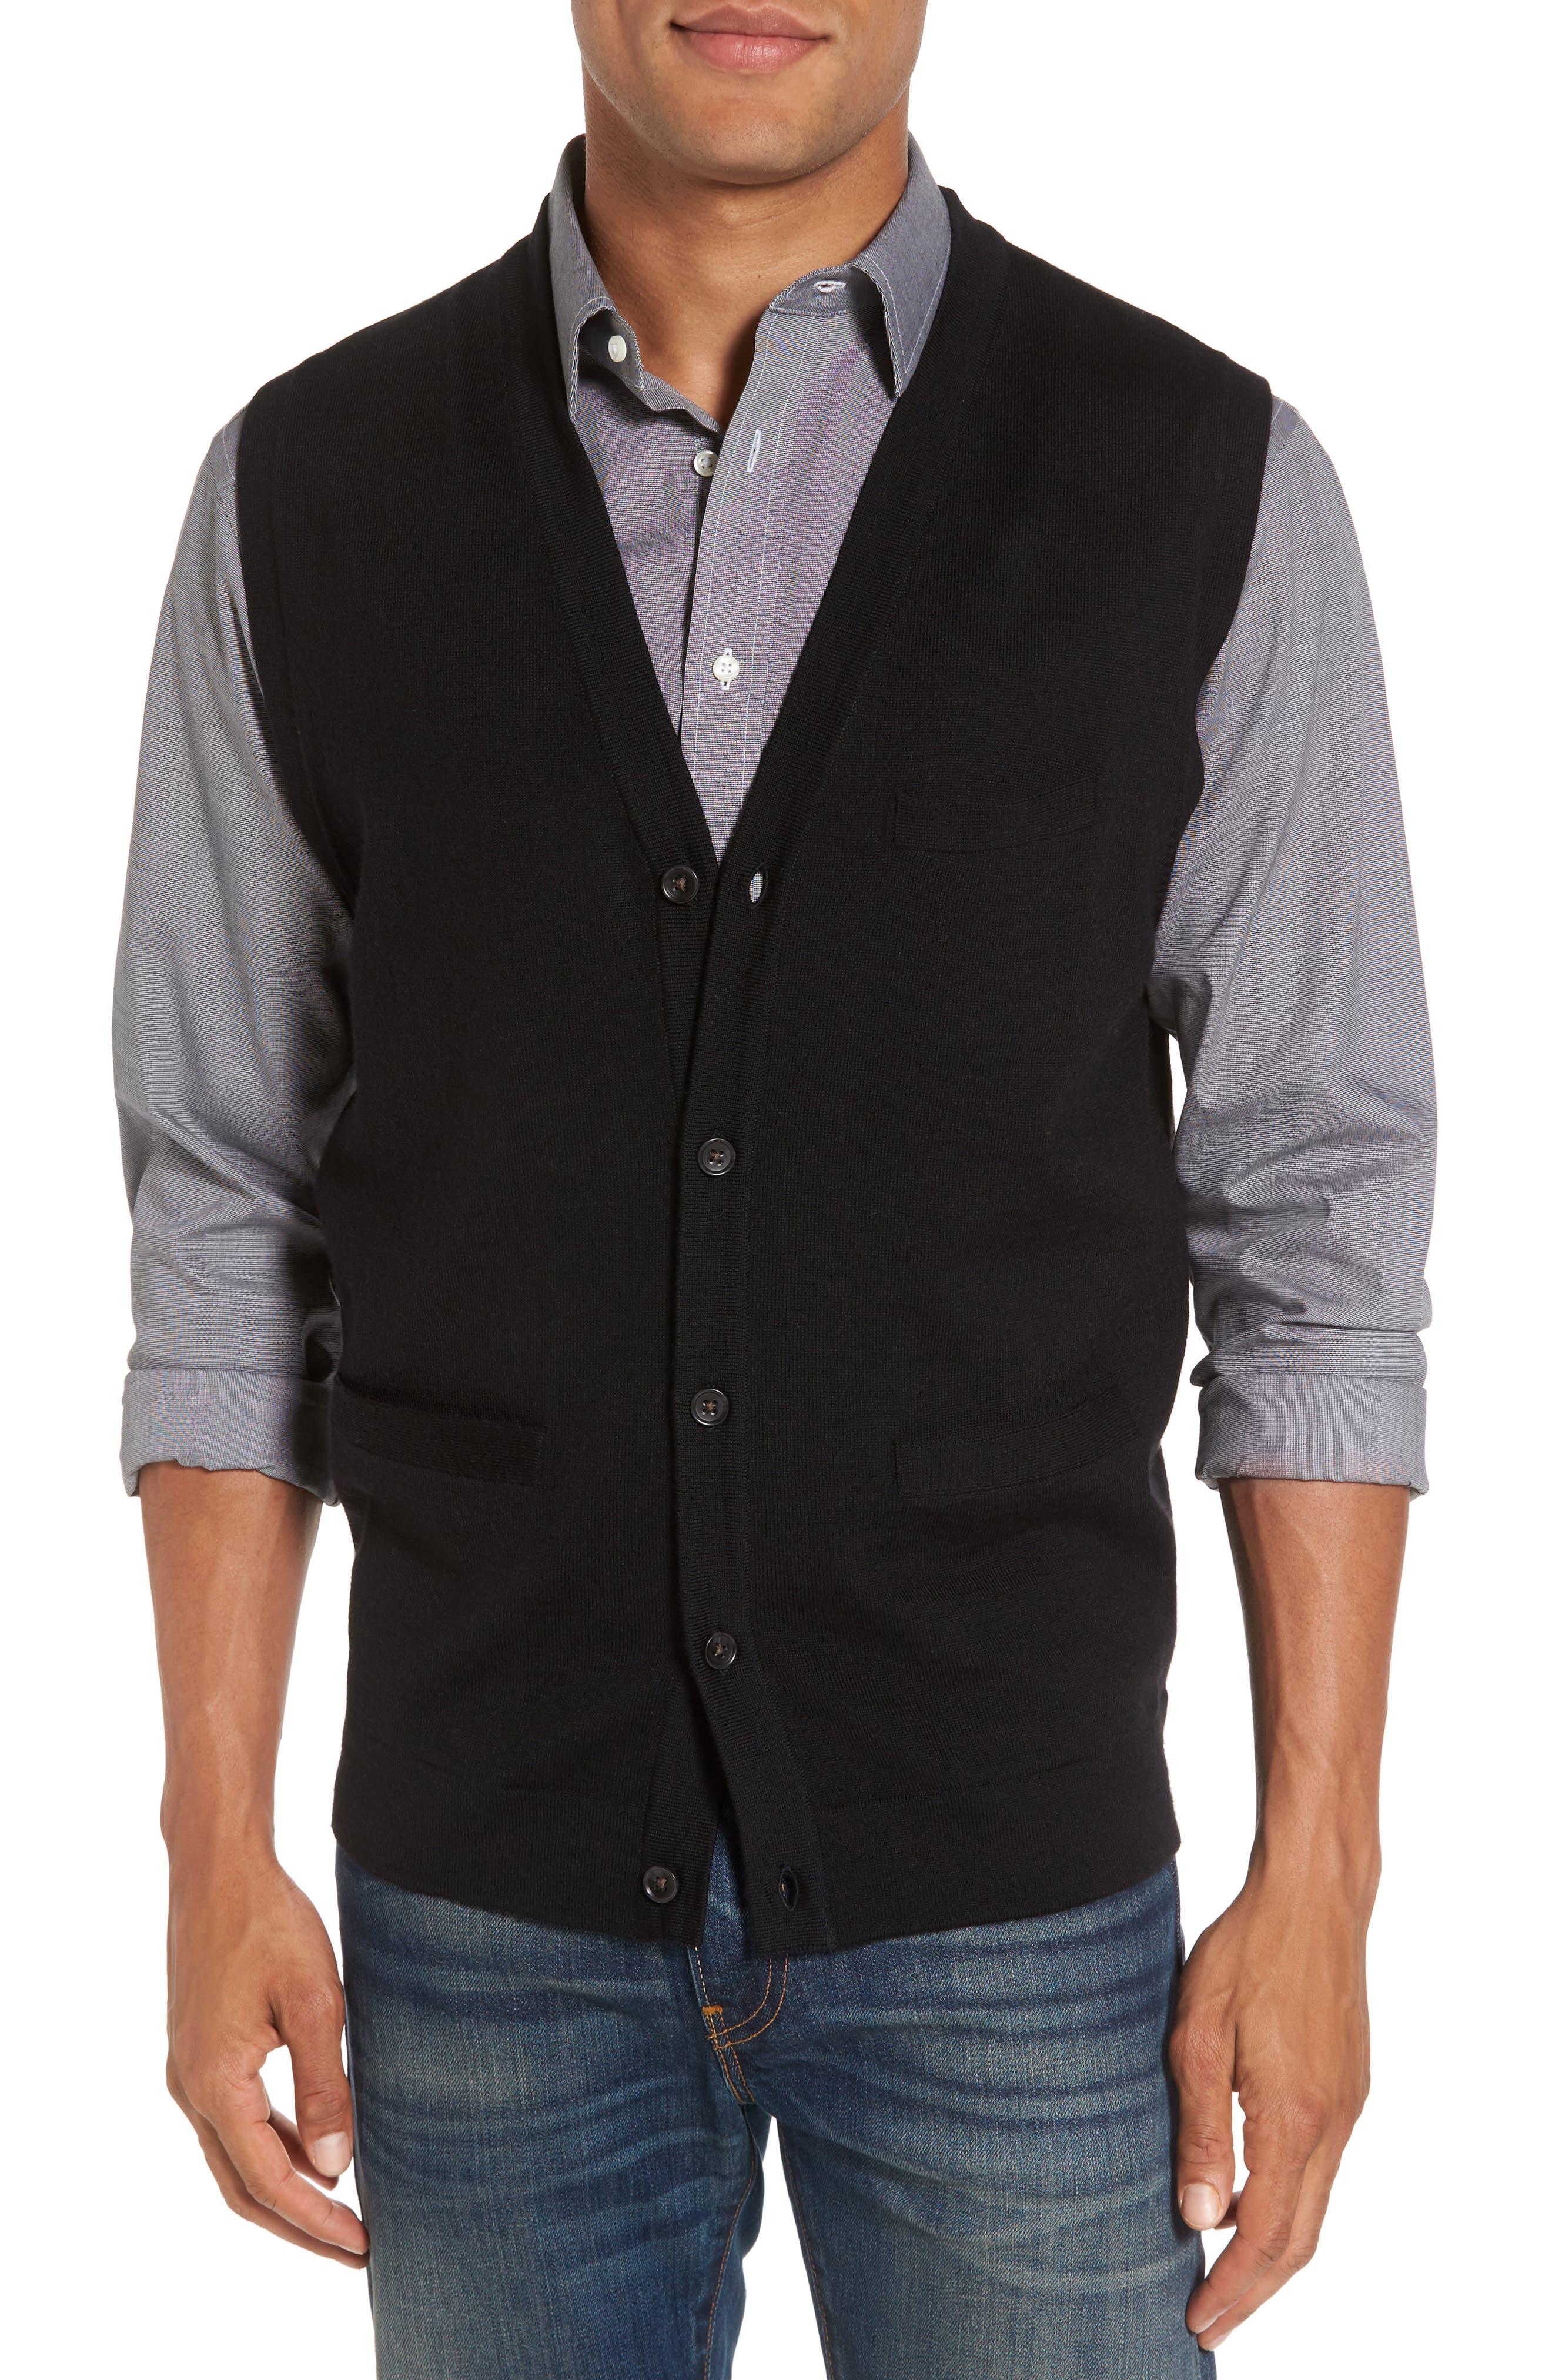 Alternate Image 1 Selected - Nordstrom Men's Shop Merino Button Front Sweater Vest